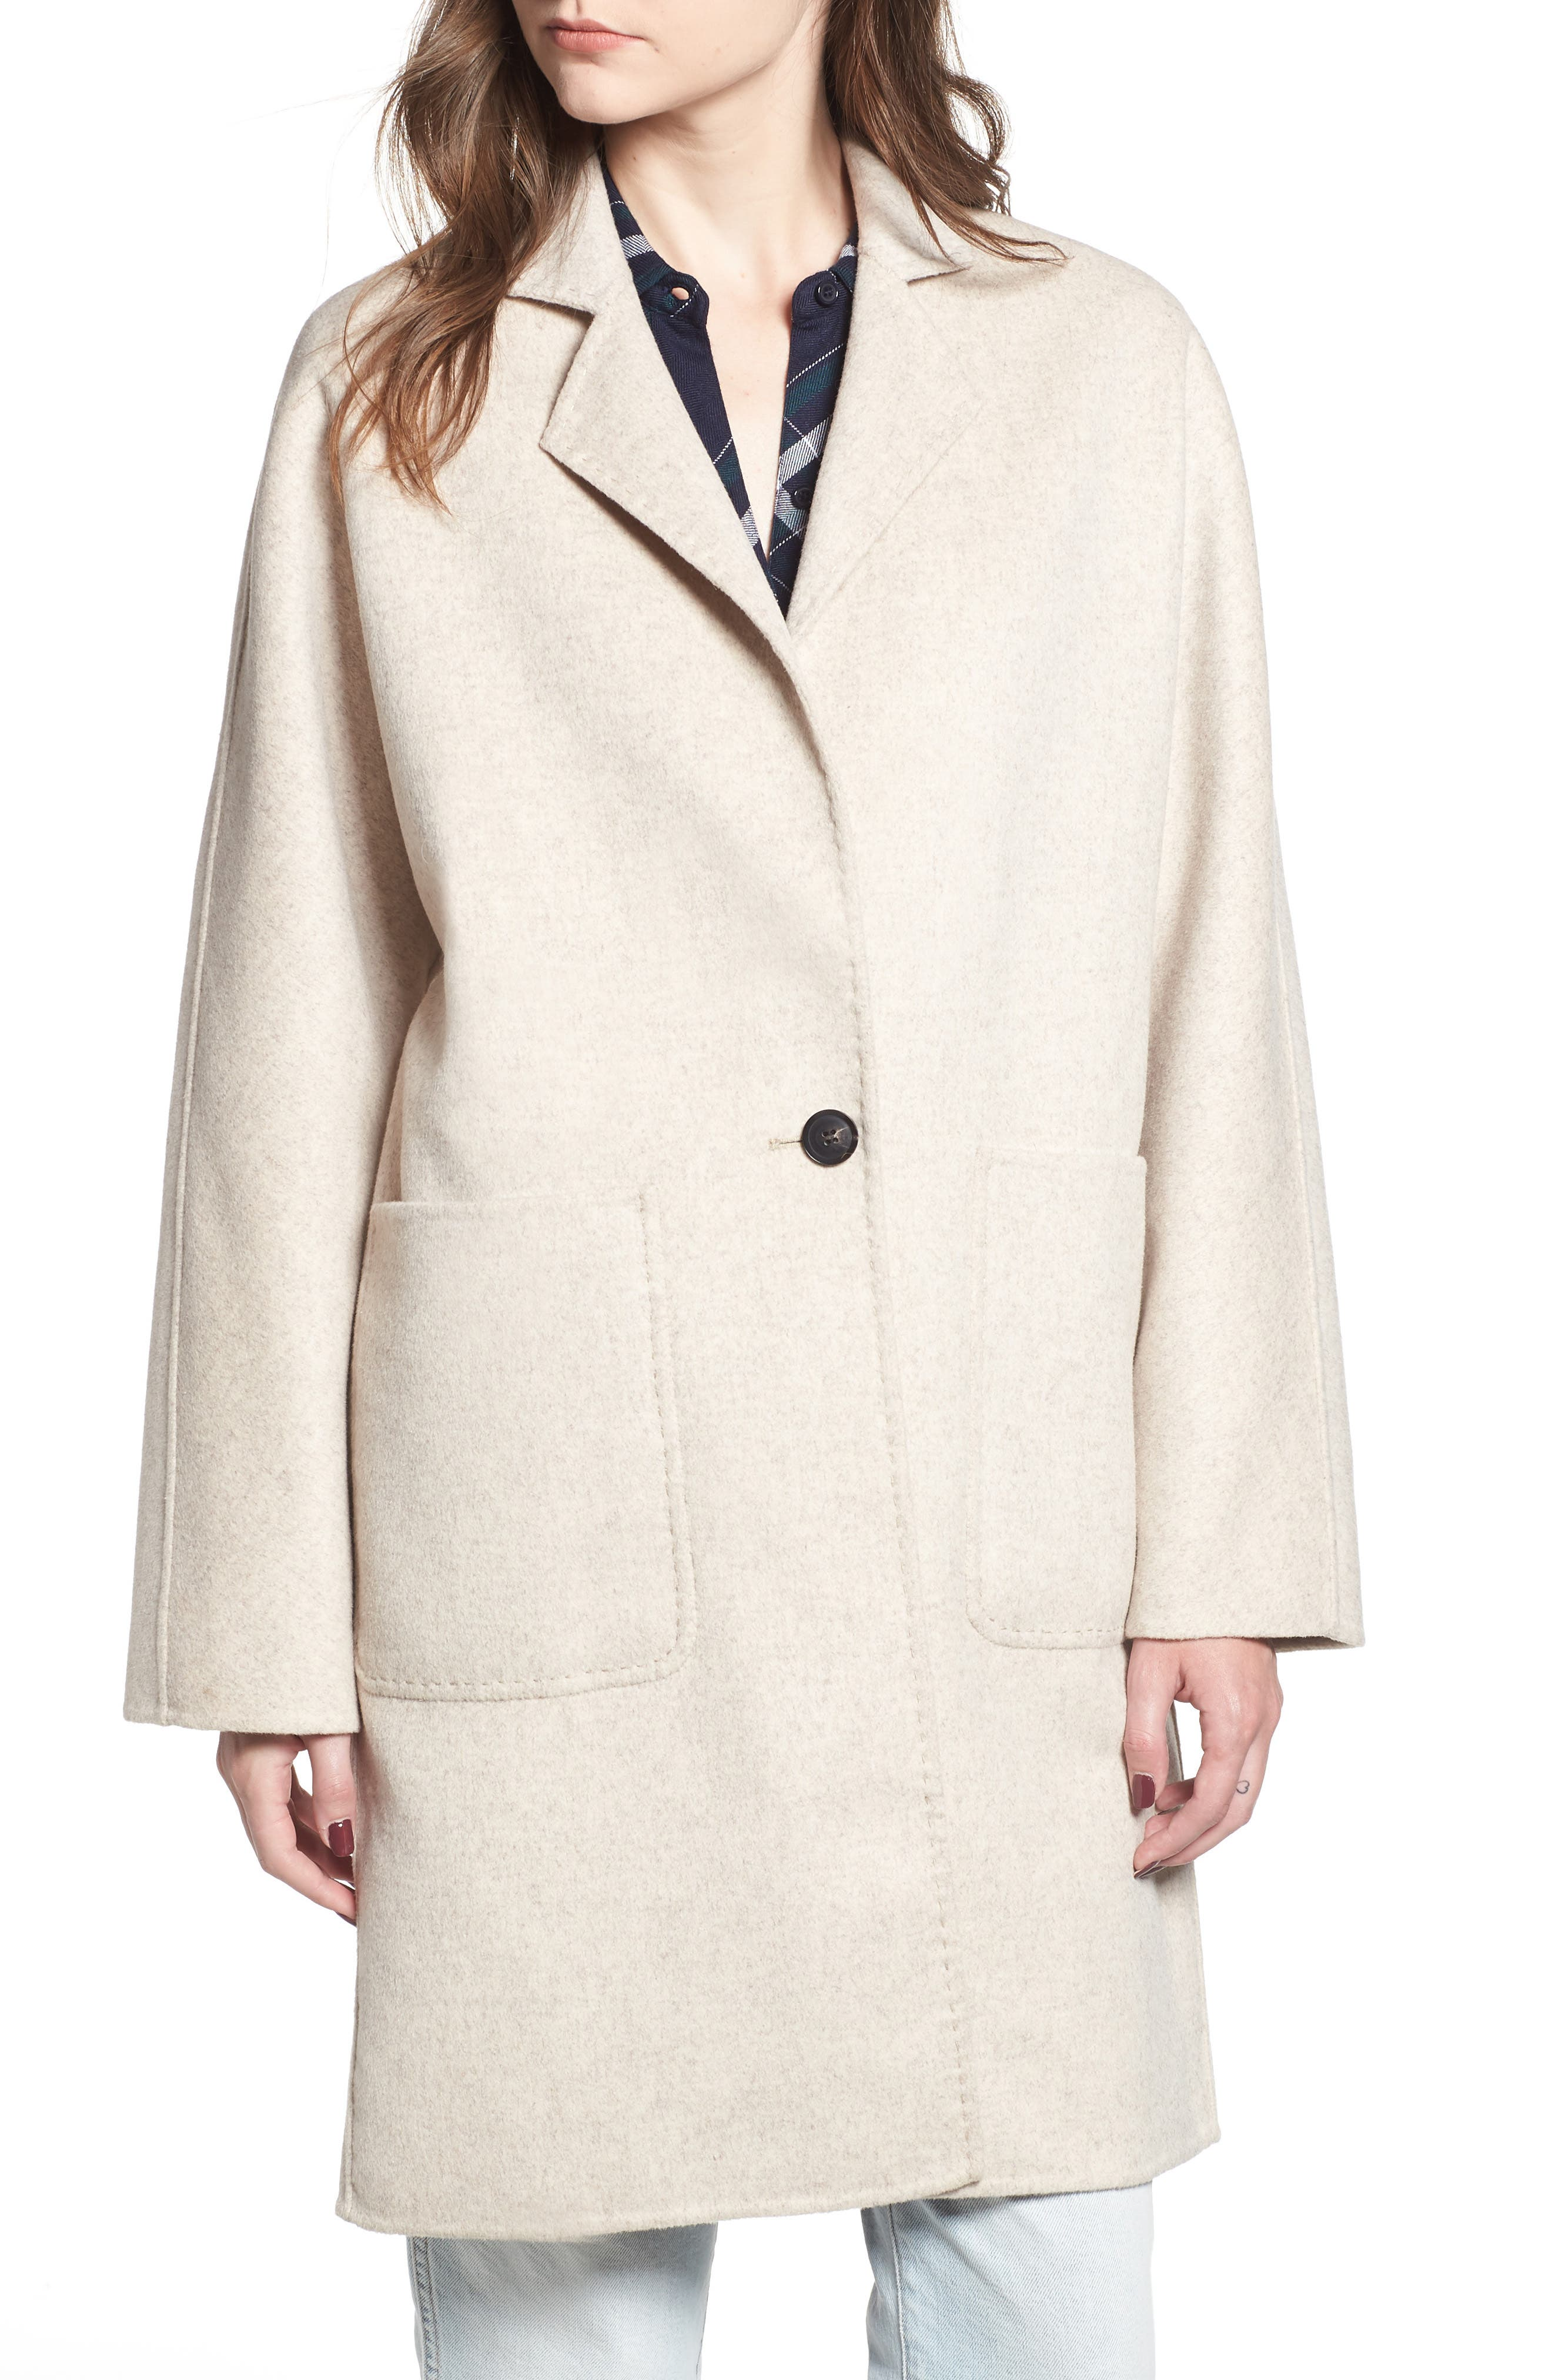 Everest Wool Blend Coat,                             Alternate thumbnail 6, color,                             905